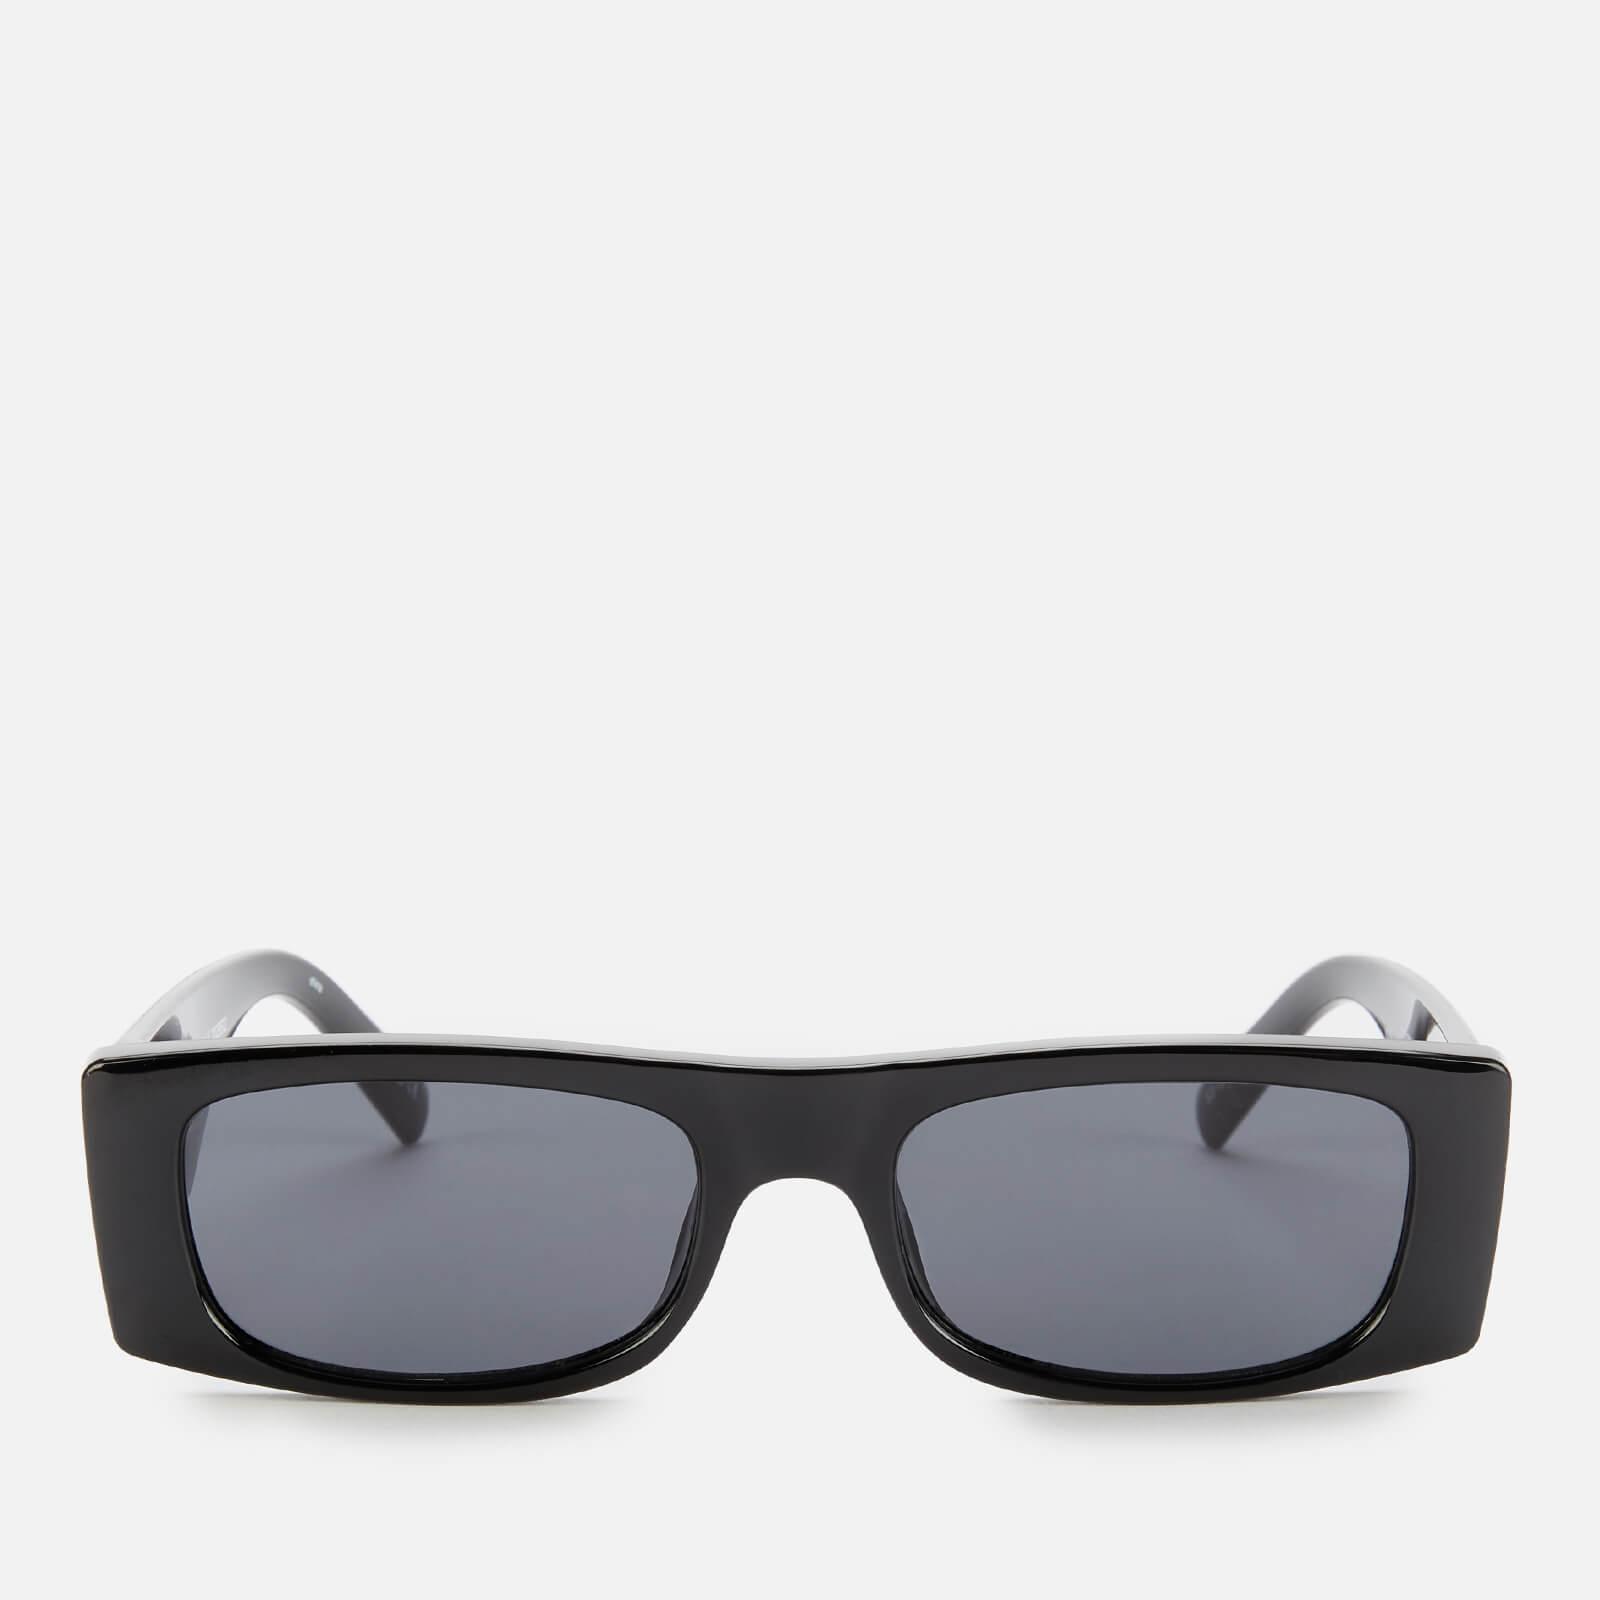 Le Specs Women's Recovery Rectangular Sunglasses - Black